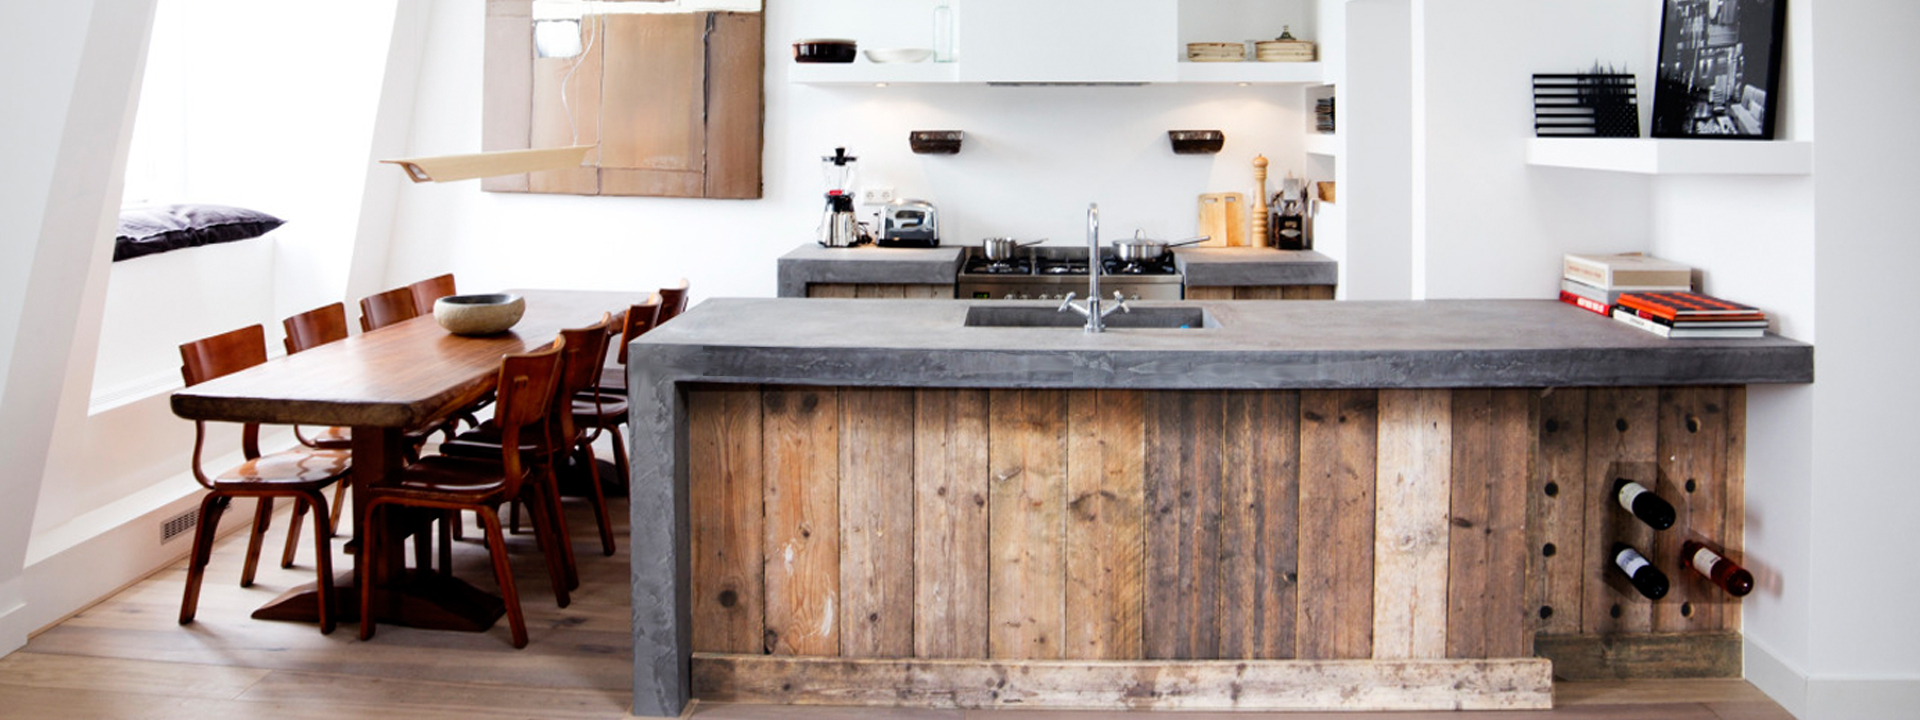 Keuken Steigerhout Beton : F?RN Keukens Keukens van steigerhout, sloophout en microbeton